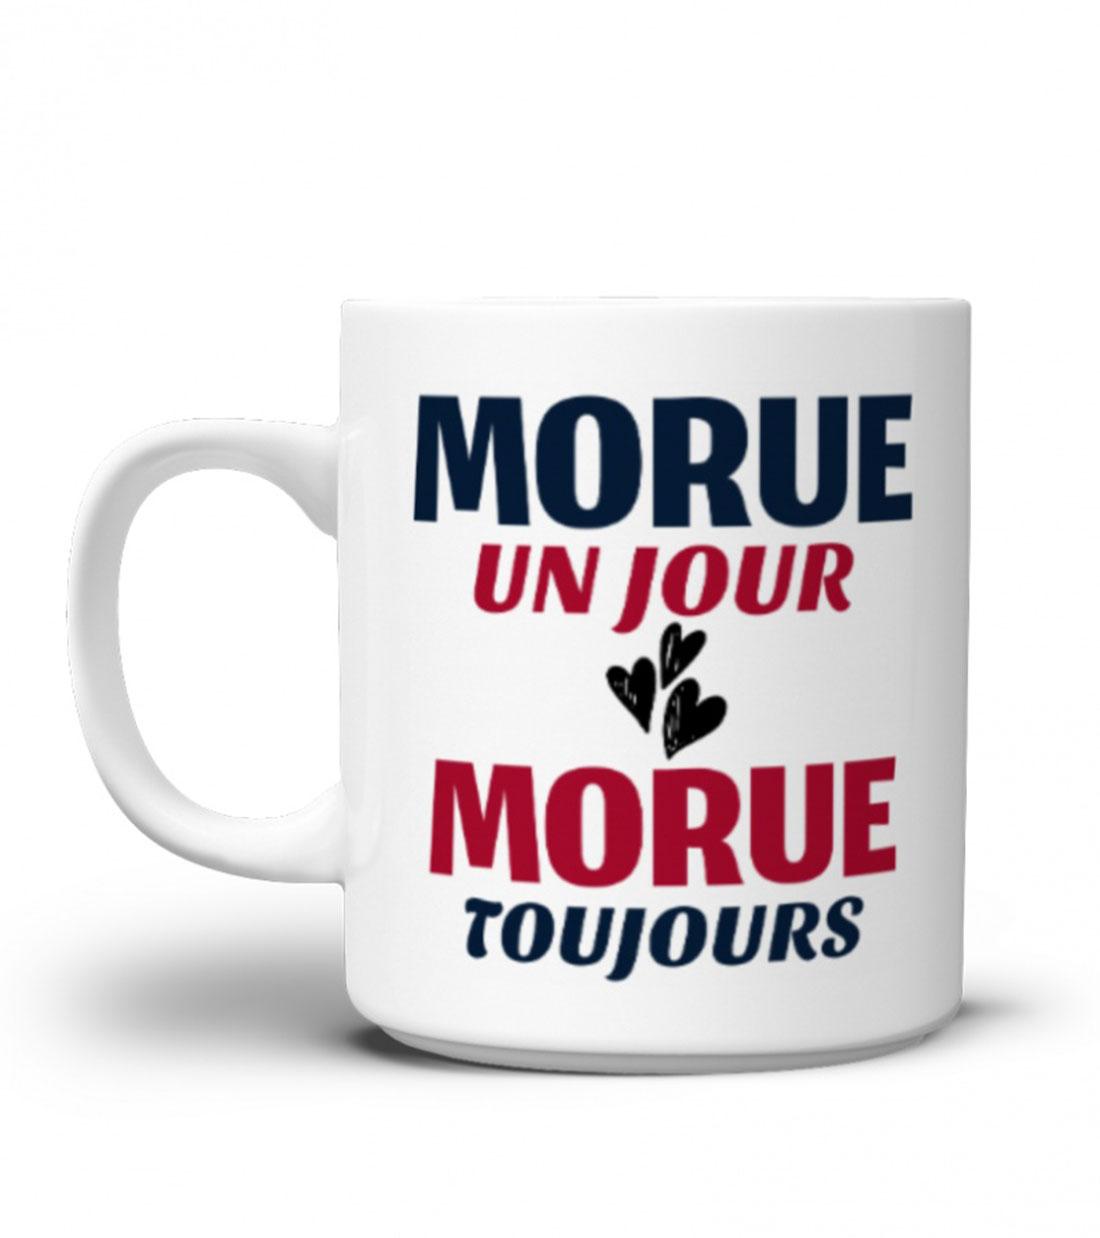 Morue-un-jour-morue-toujours-tasse-mug-2